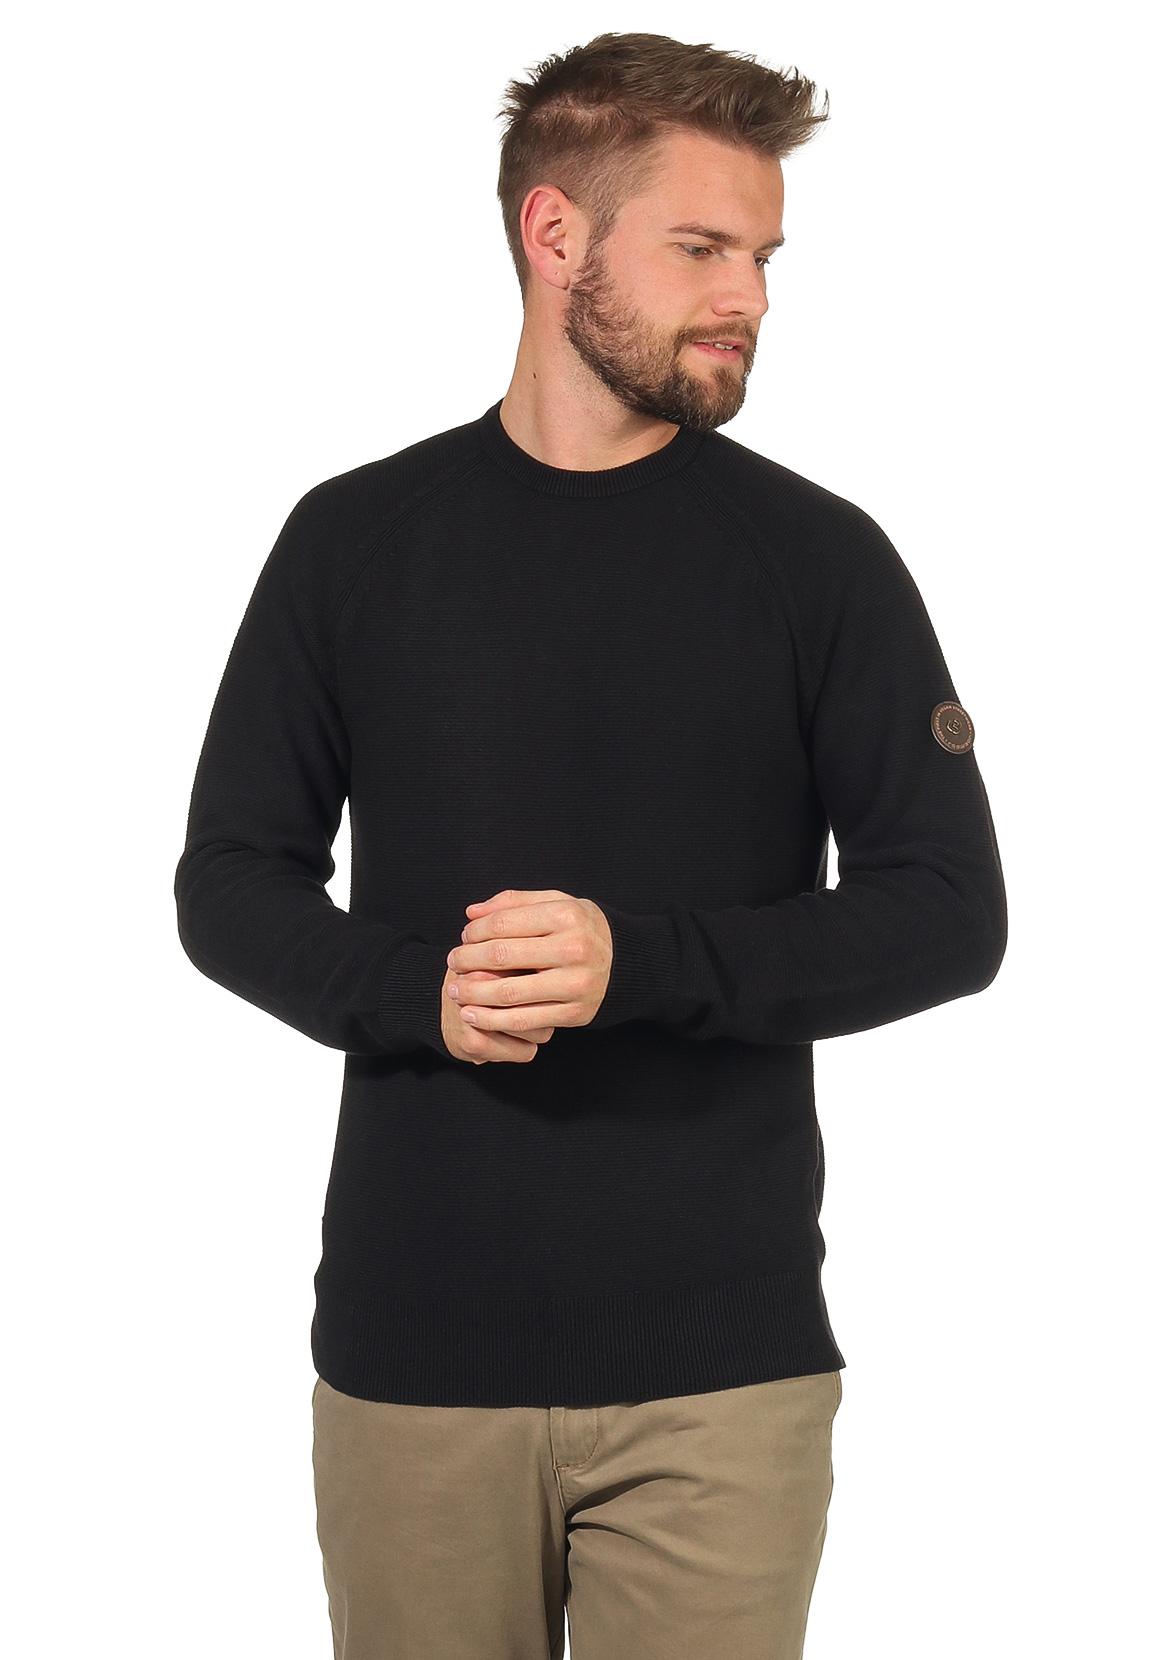 Ragwear Sweater Herren HANKAS 2022-35001 Schwarz Black 1010